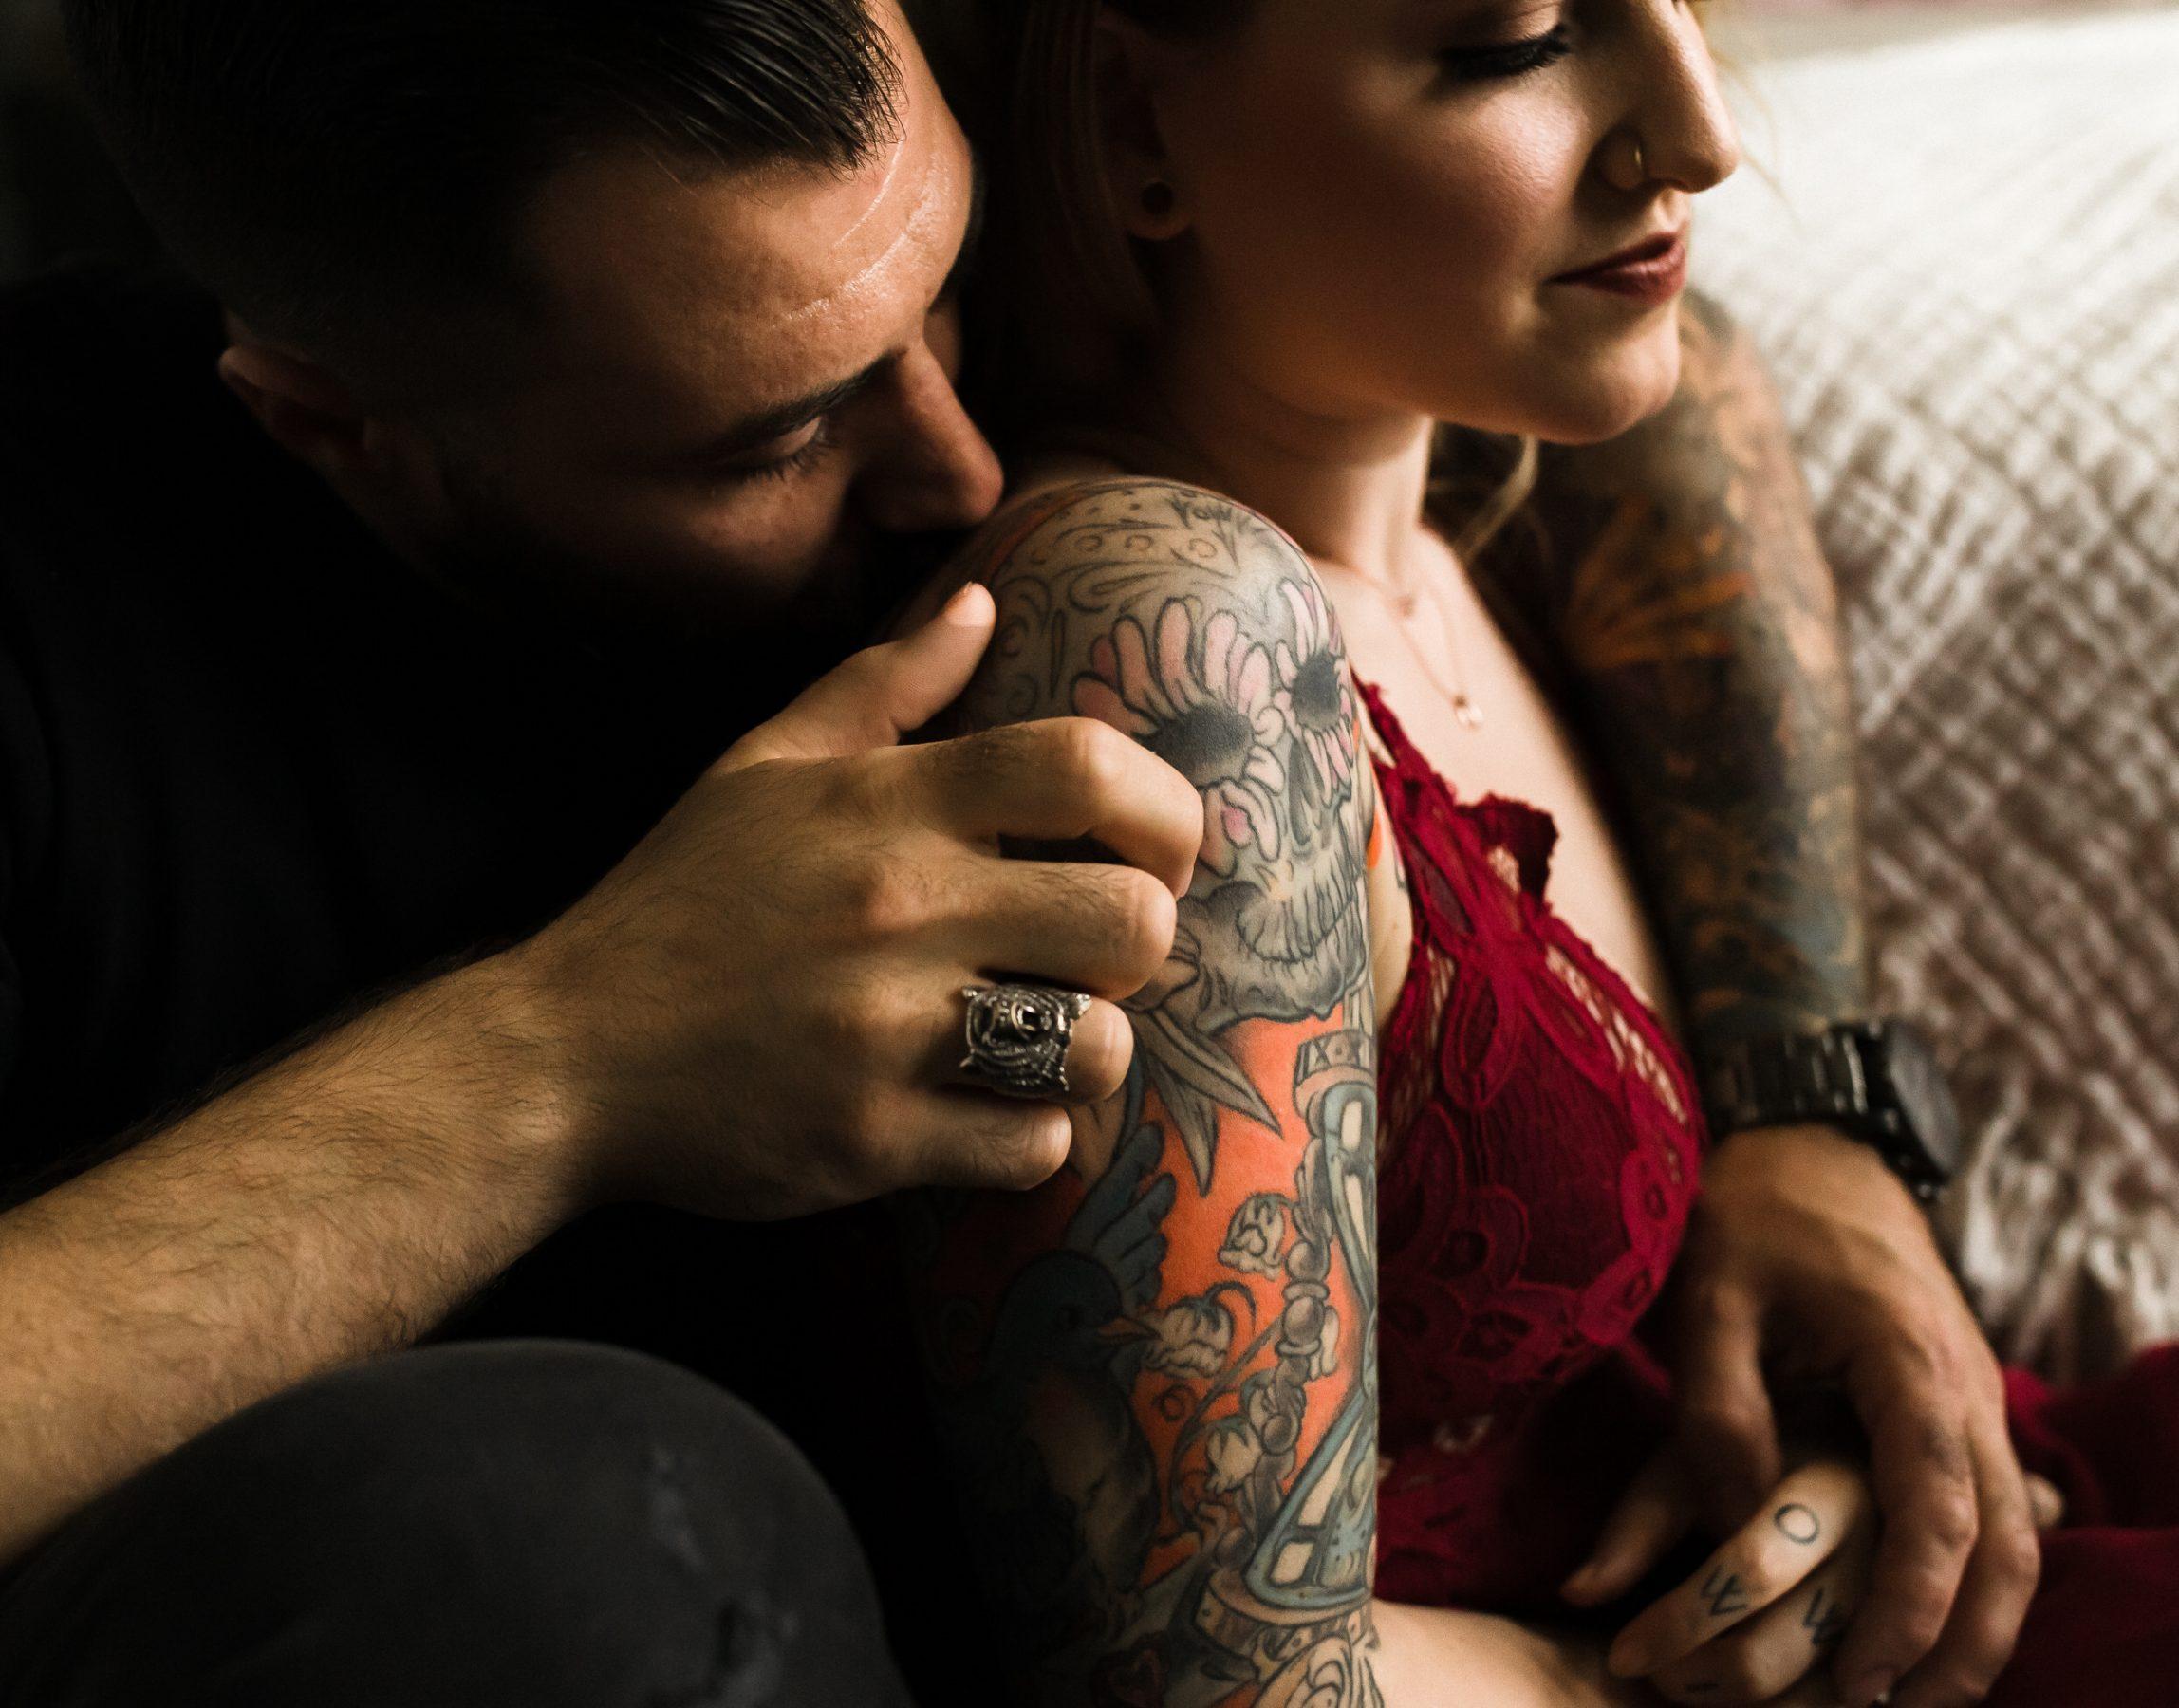 couples intimate boudoir session, toronto photographer